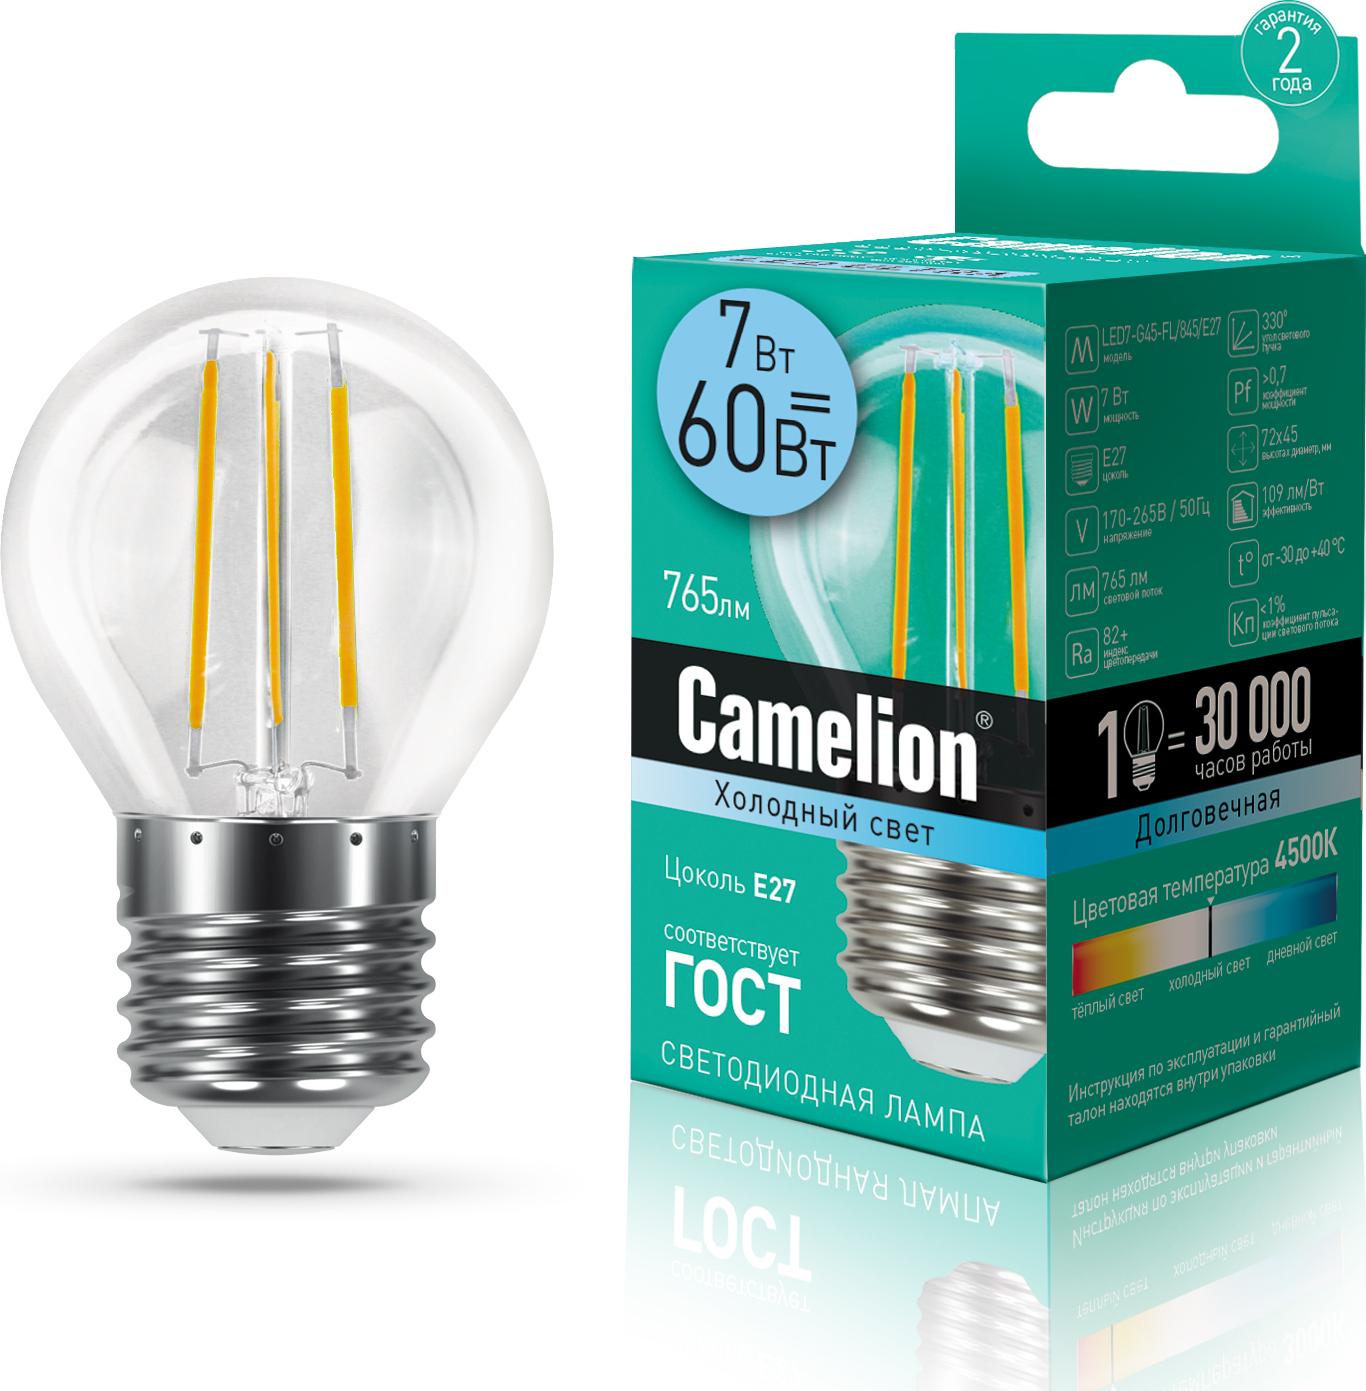 Лампа Camelion LED7-G45-FL/845/E27